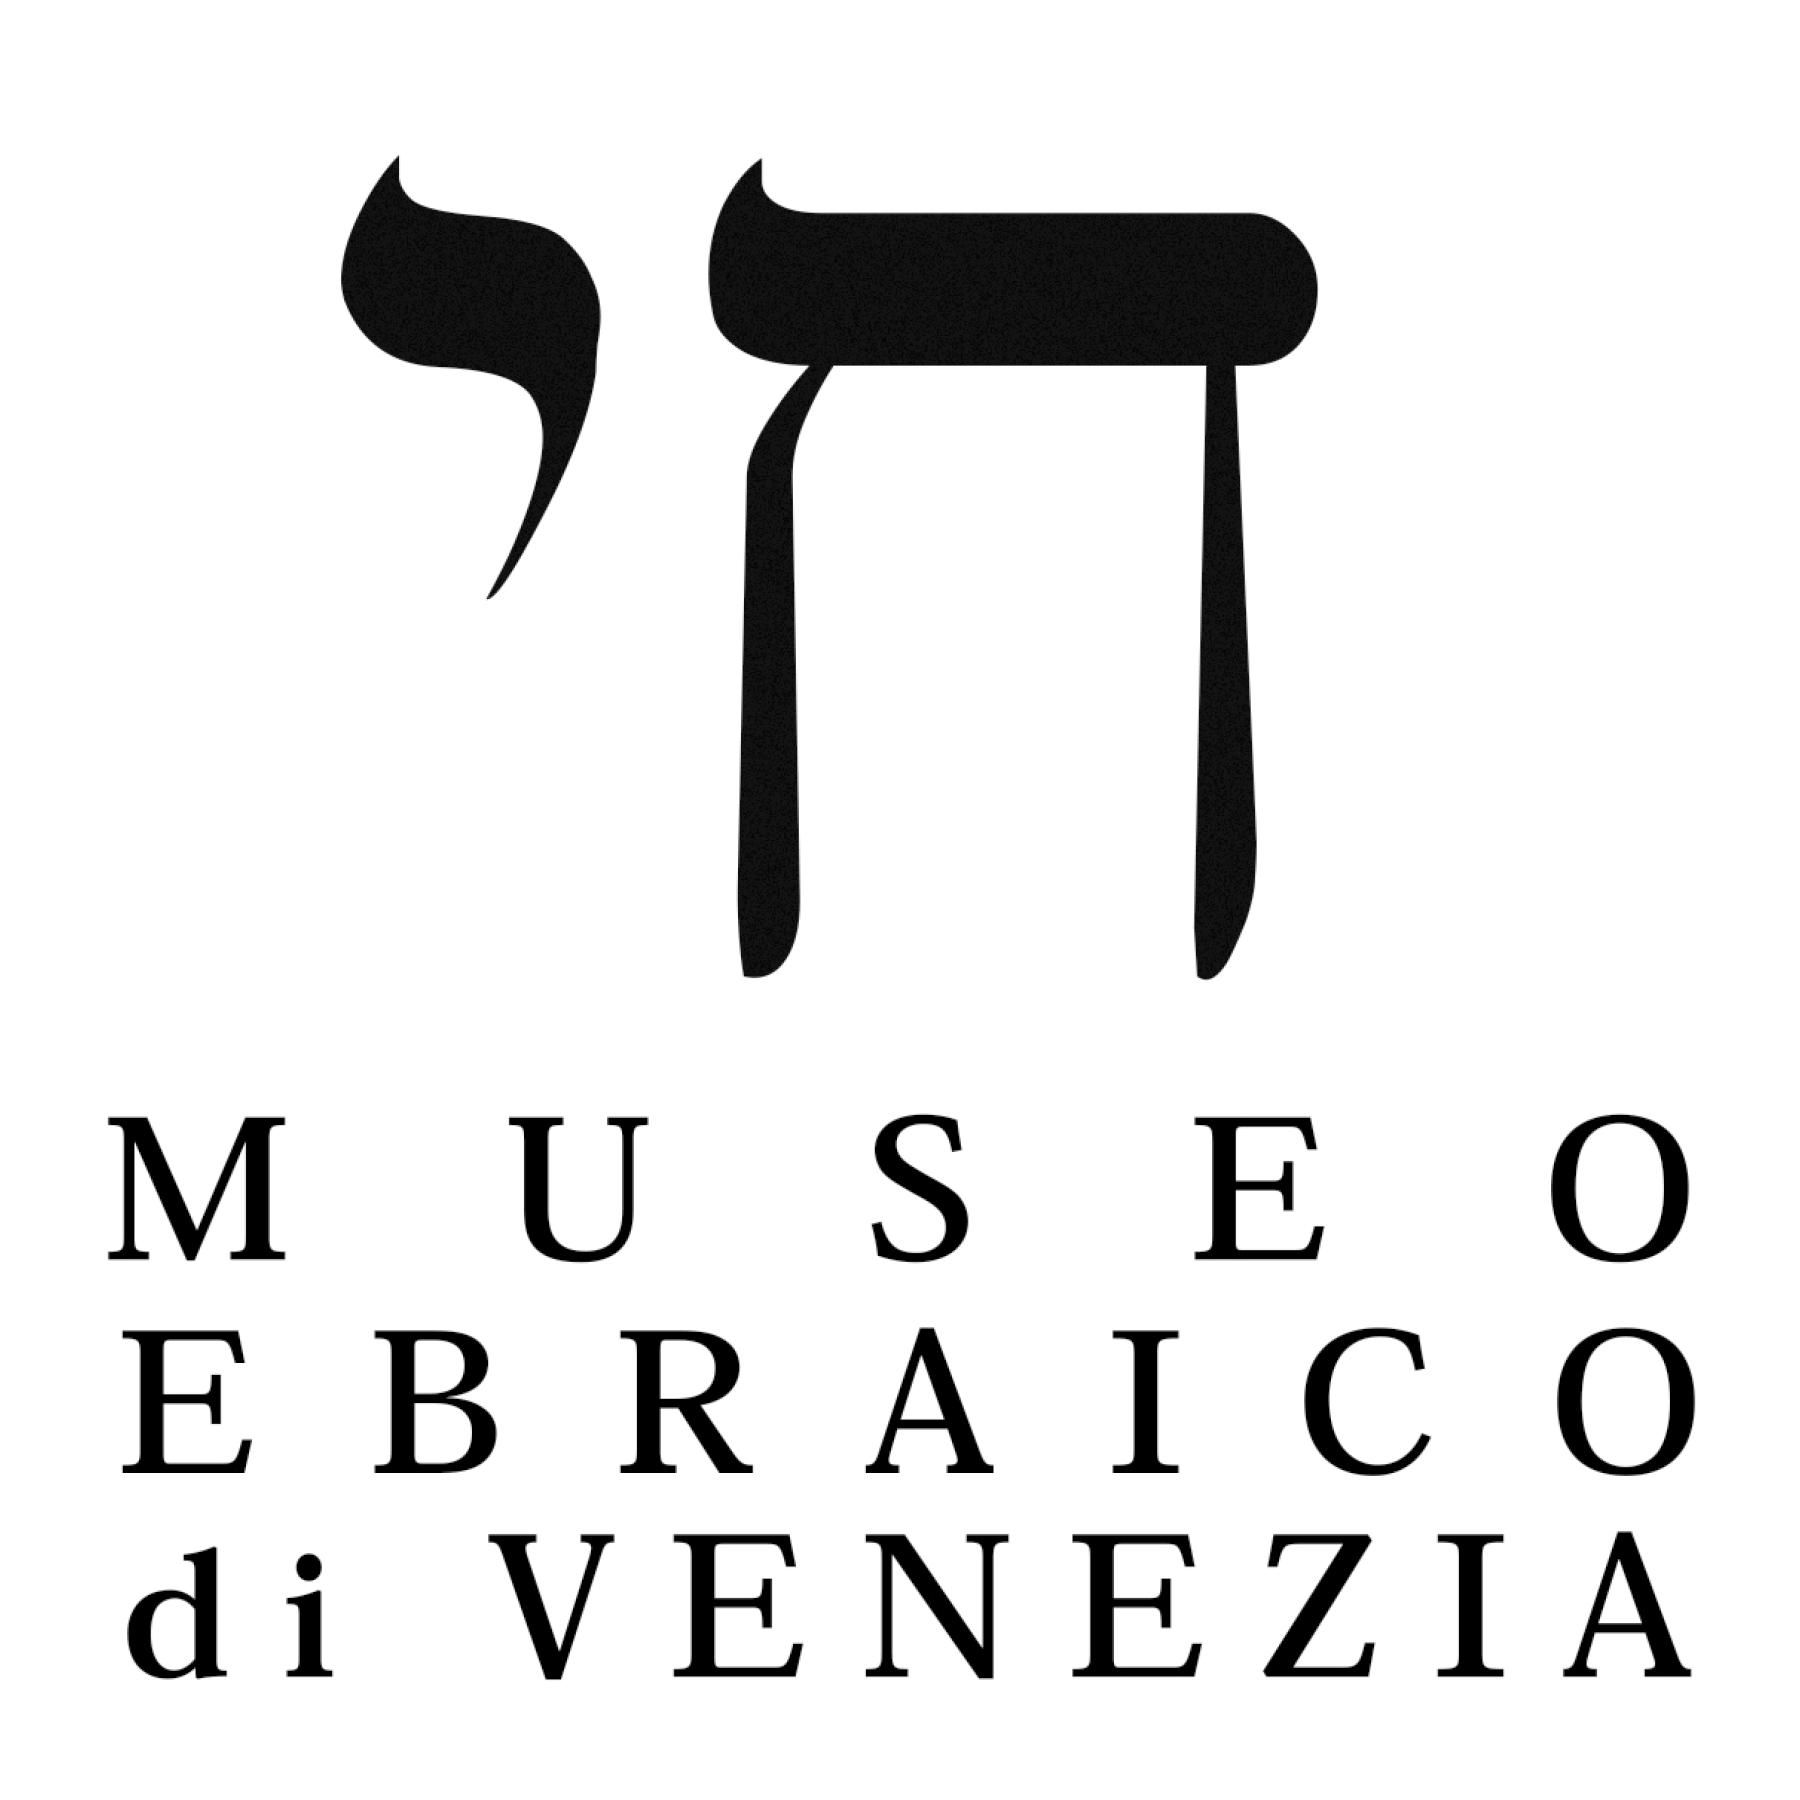 EdW_psalm_logos2.png